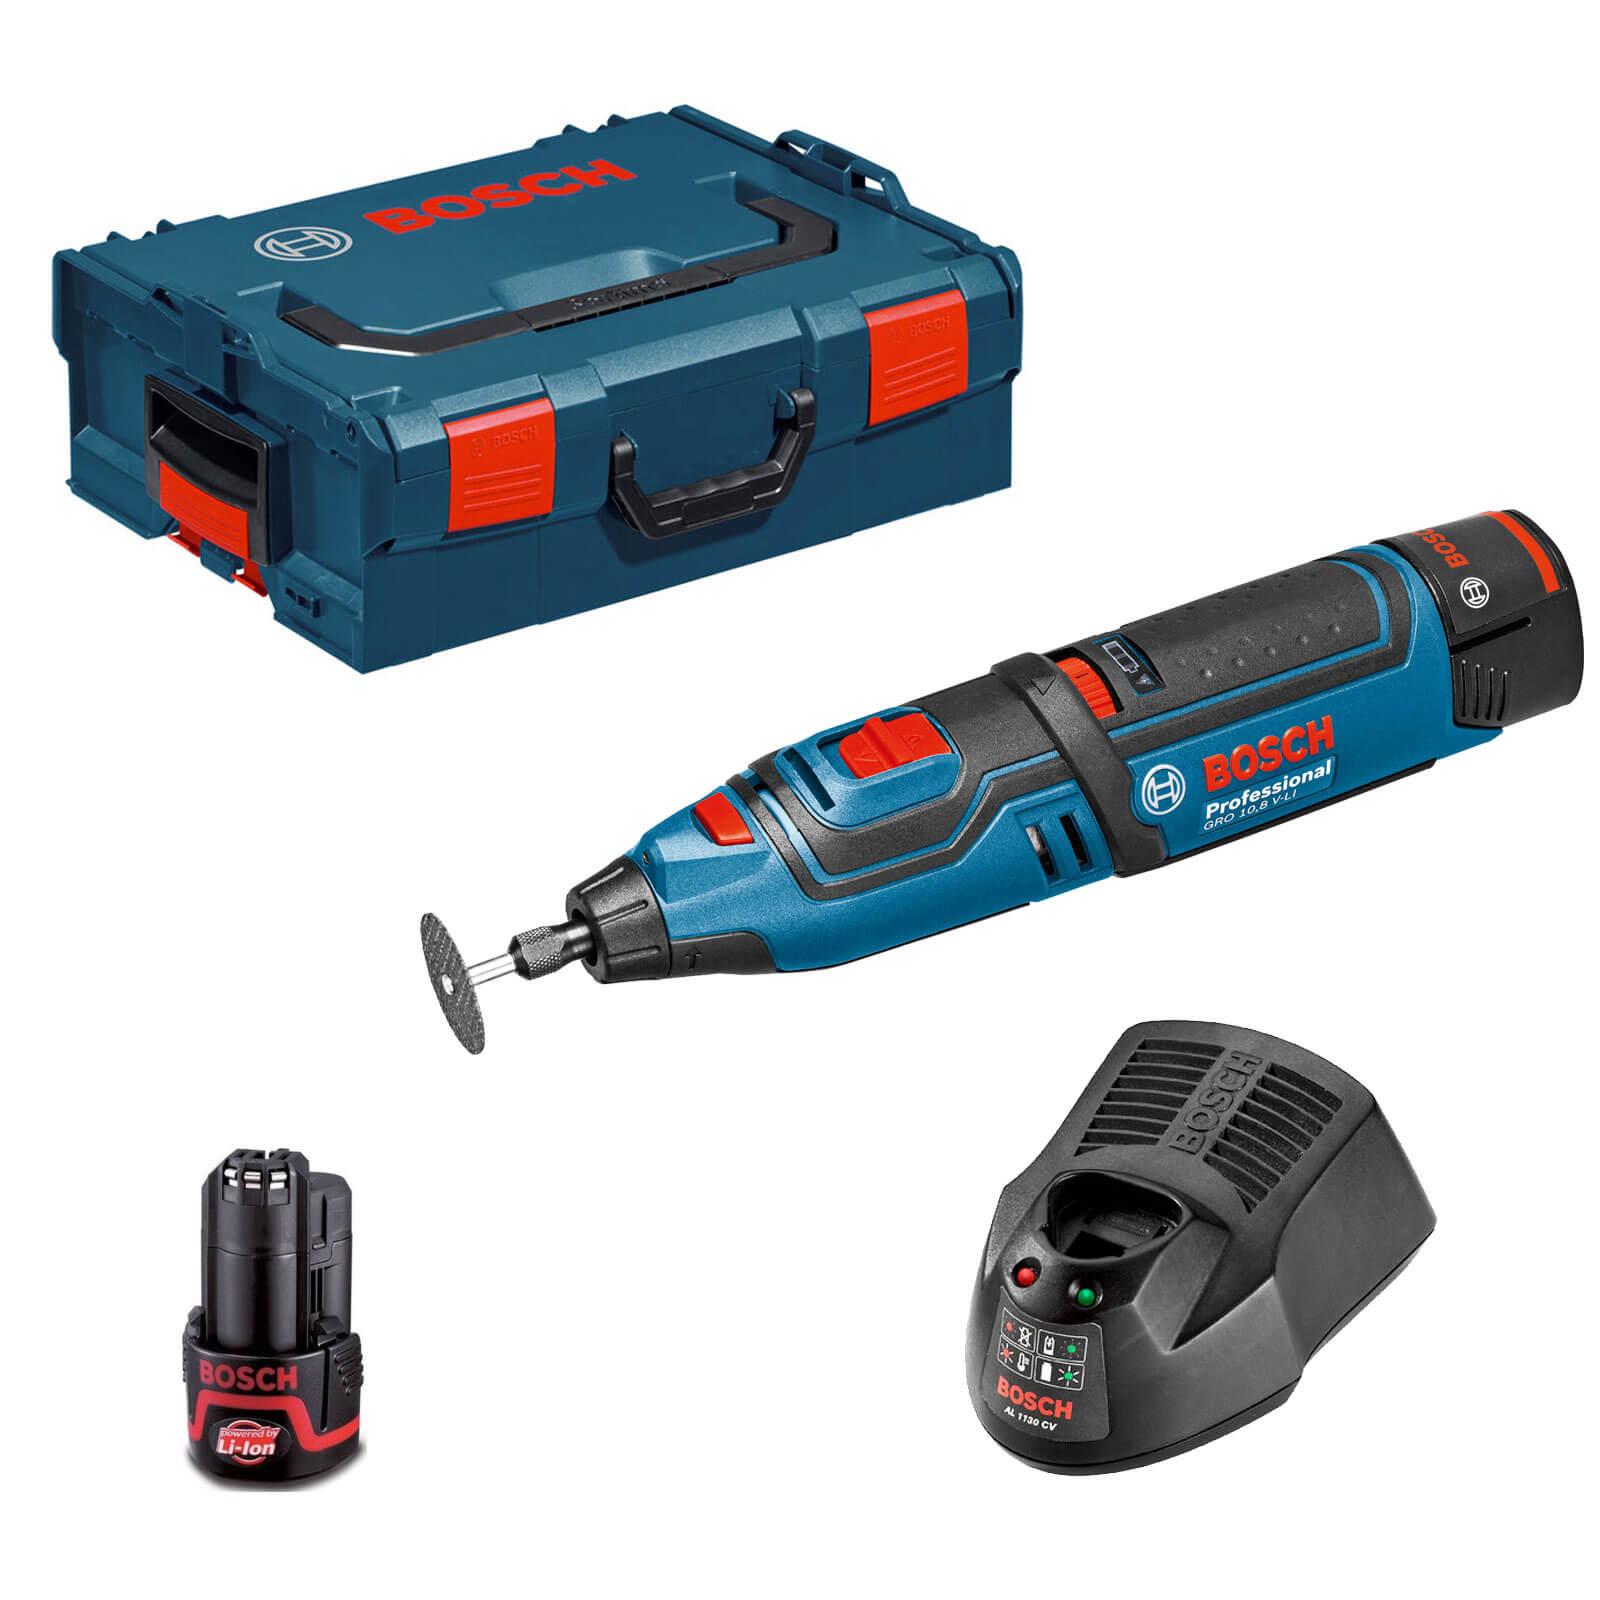 Bosch GRO 10.8 V LI 10.8v Cordless Multi Tool with Accessories, L Boxx 2 Li ion Batteries 2ah